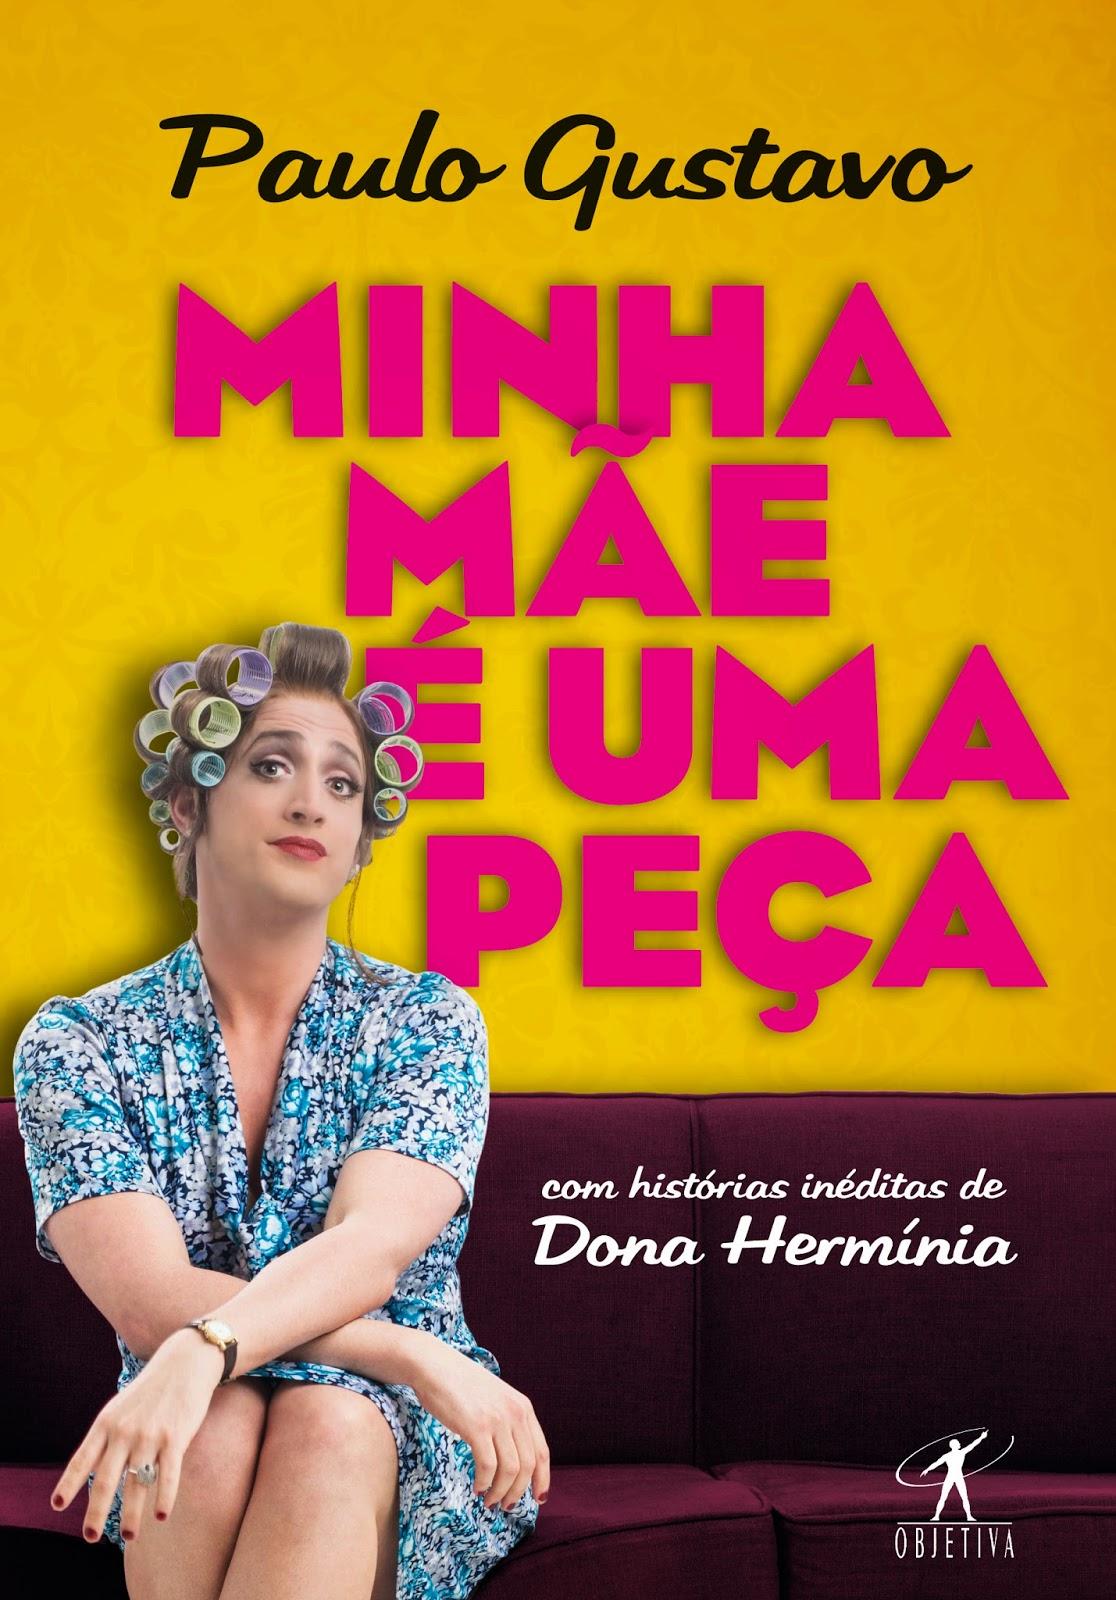 [Resenha] Minha mãe é uma peça - Paulo Gustavo @EditoraObjetiva